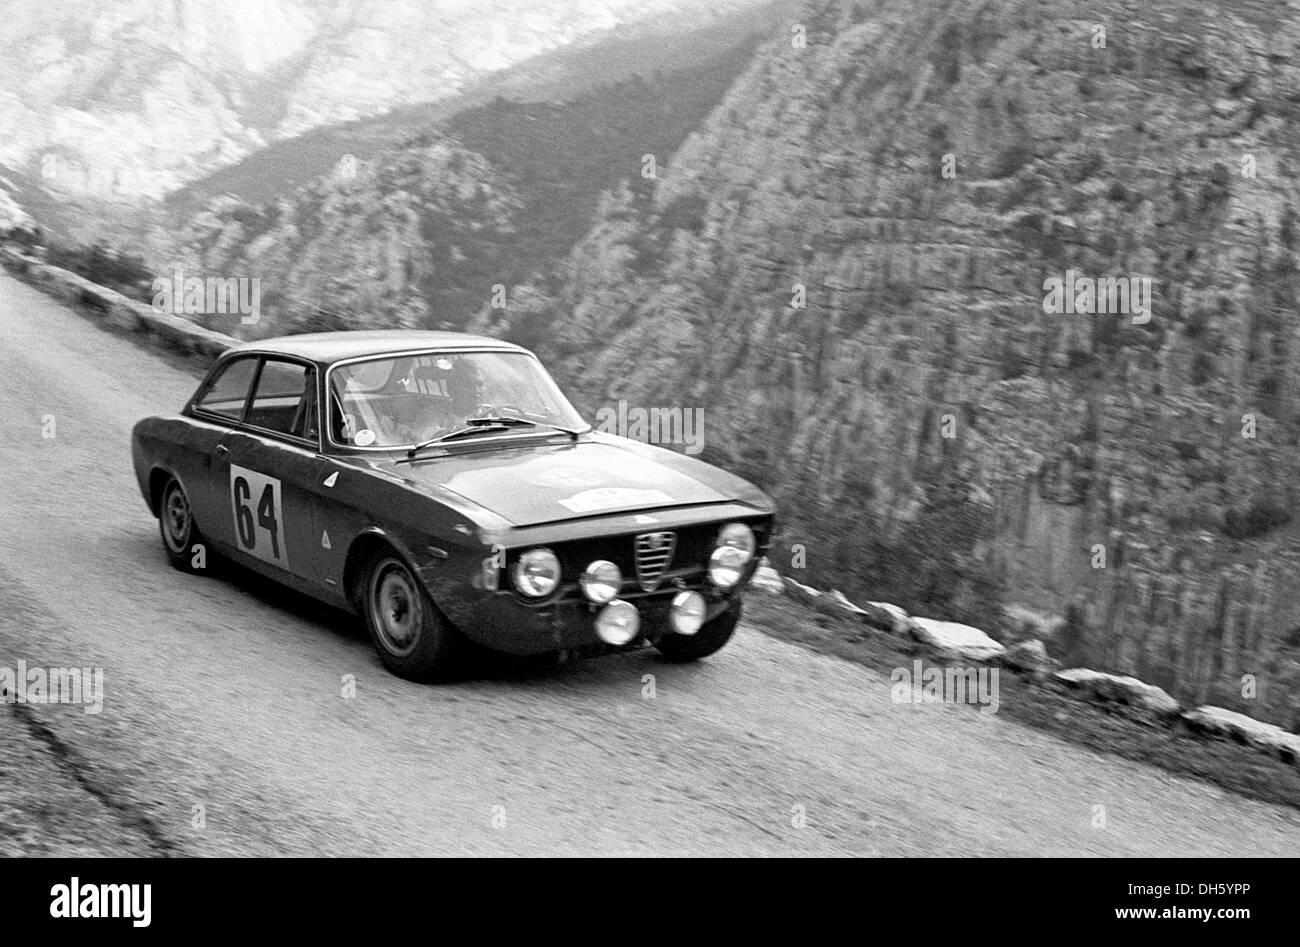 Alfa Romeo Gta In The Corsica Rally 1965 Stock Photo Alamy